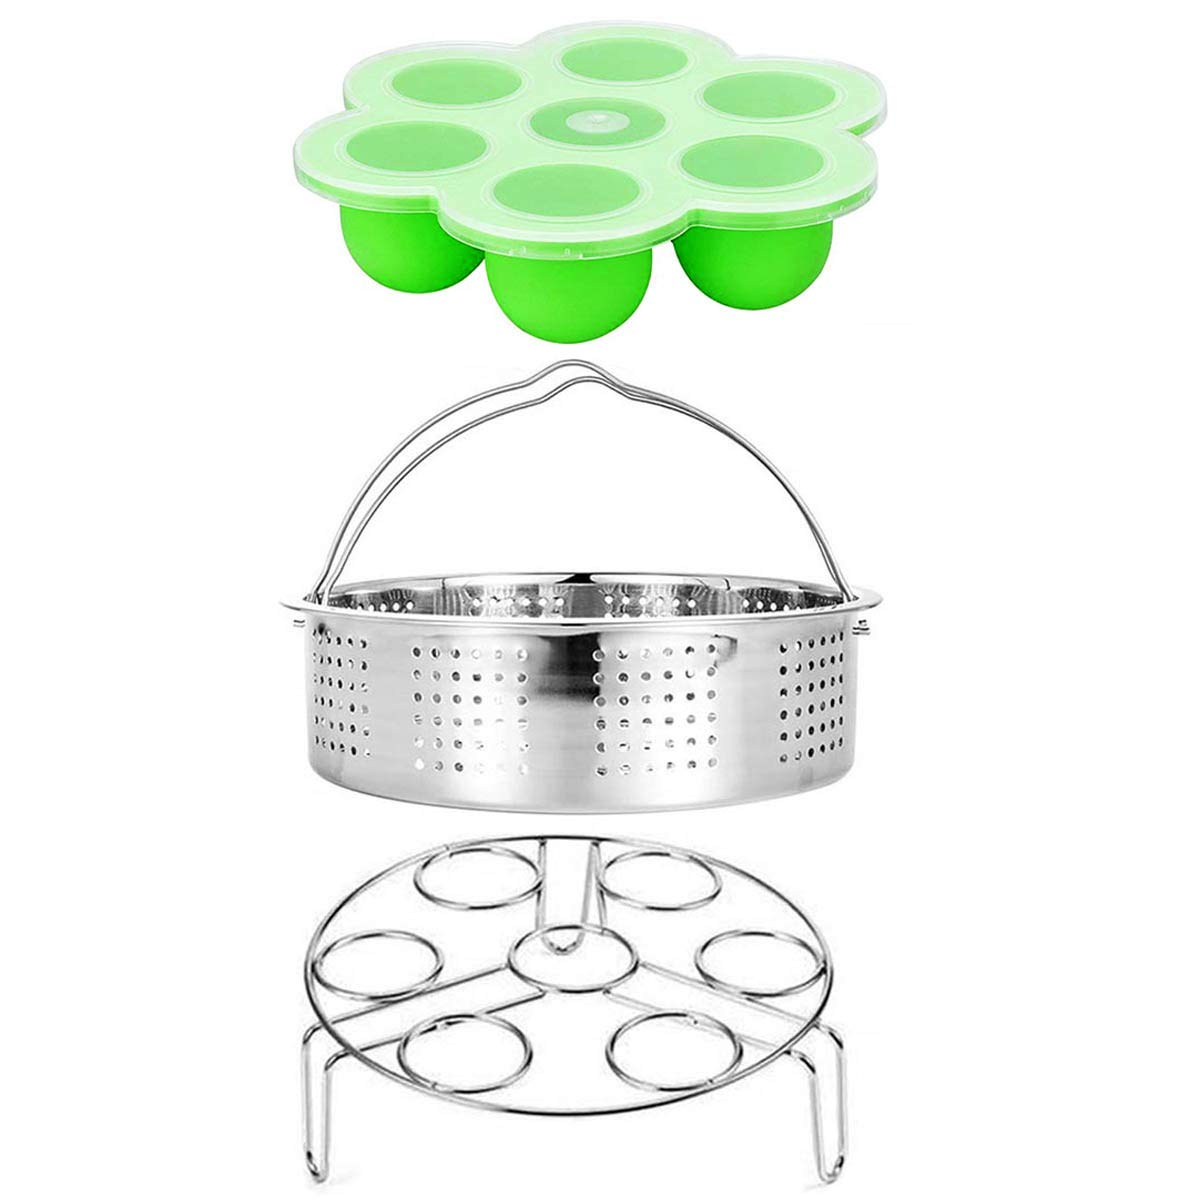 Steamer Basket, Egg Rack Holder, Silicone Egg Bites Molds for Instant Pot and Pressure Cooker Accessories, Vegetable Food Steamer Rack. Fits Pot 5,6,8 qt Pressure Cooker, Stainless Steel, 3 Pieces